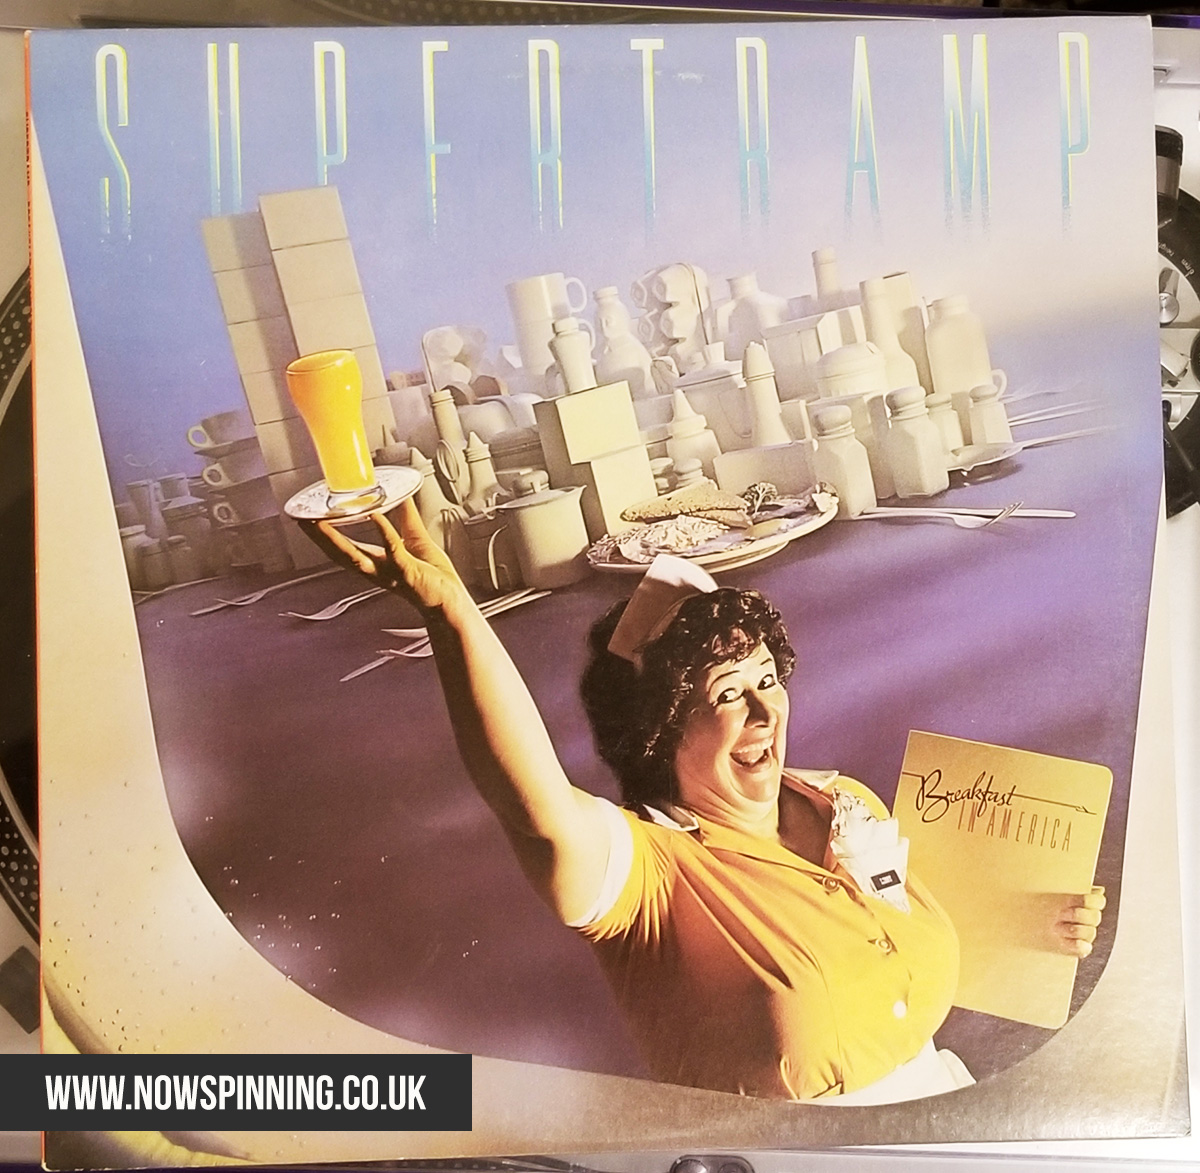 Supertramp Breakfast in America album cover